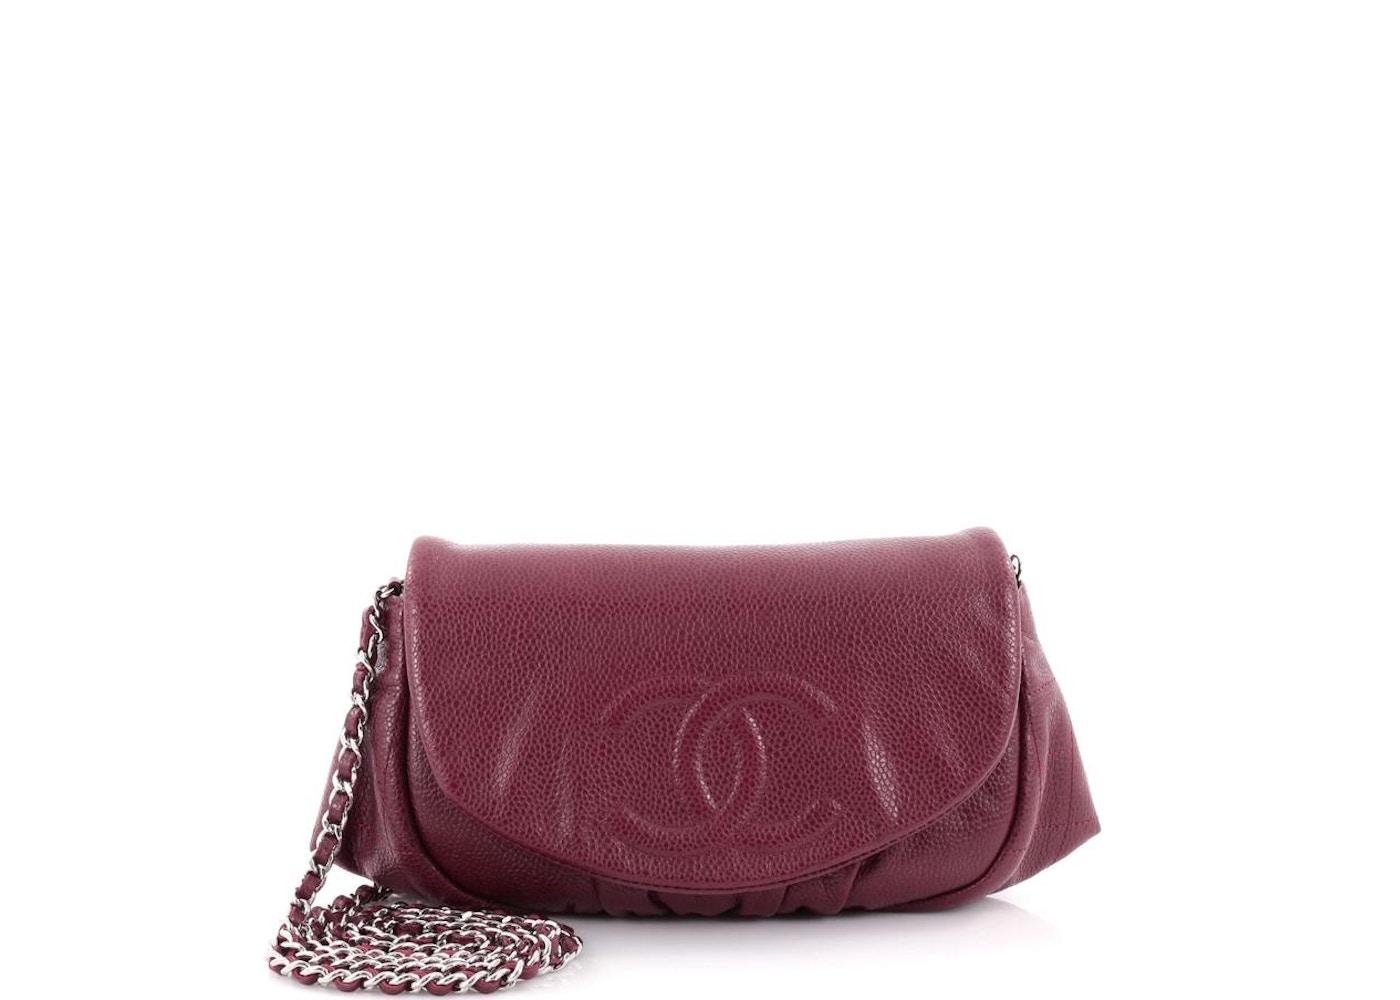 7978ceae75e3 Chanel Half Moon Wallet On Chain Burgundy. Burgundy